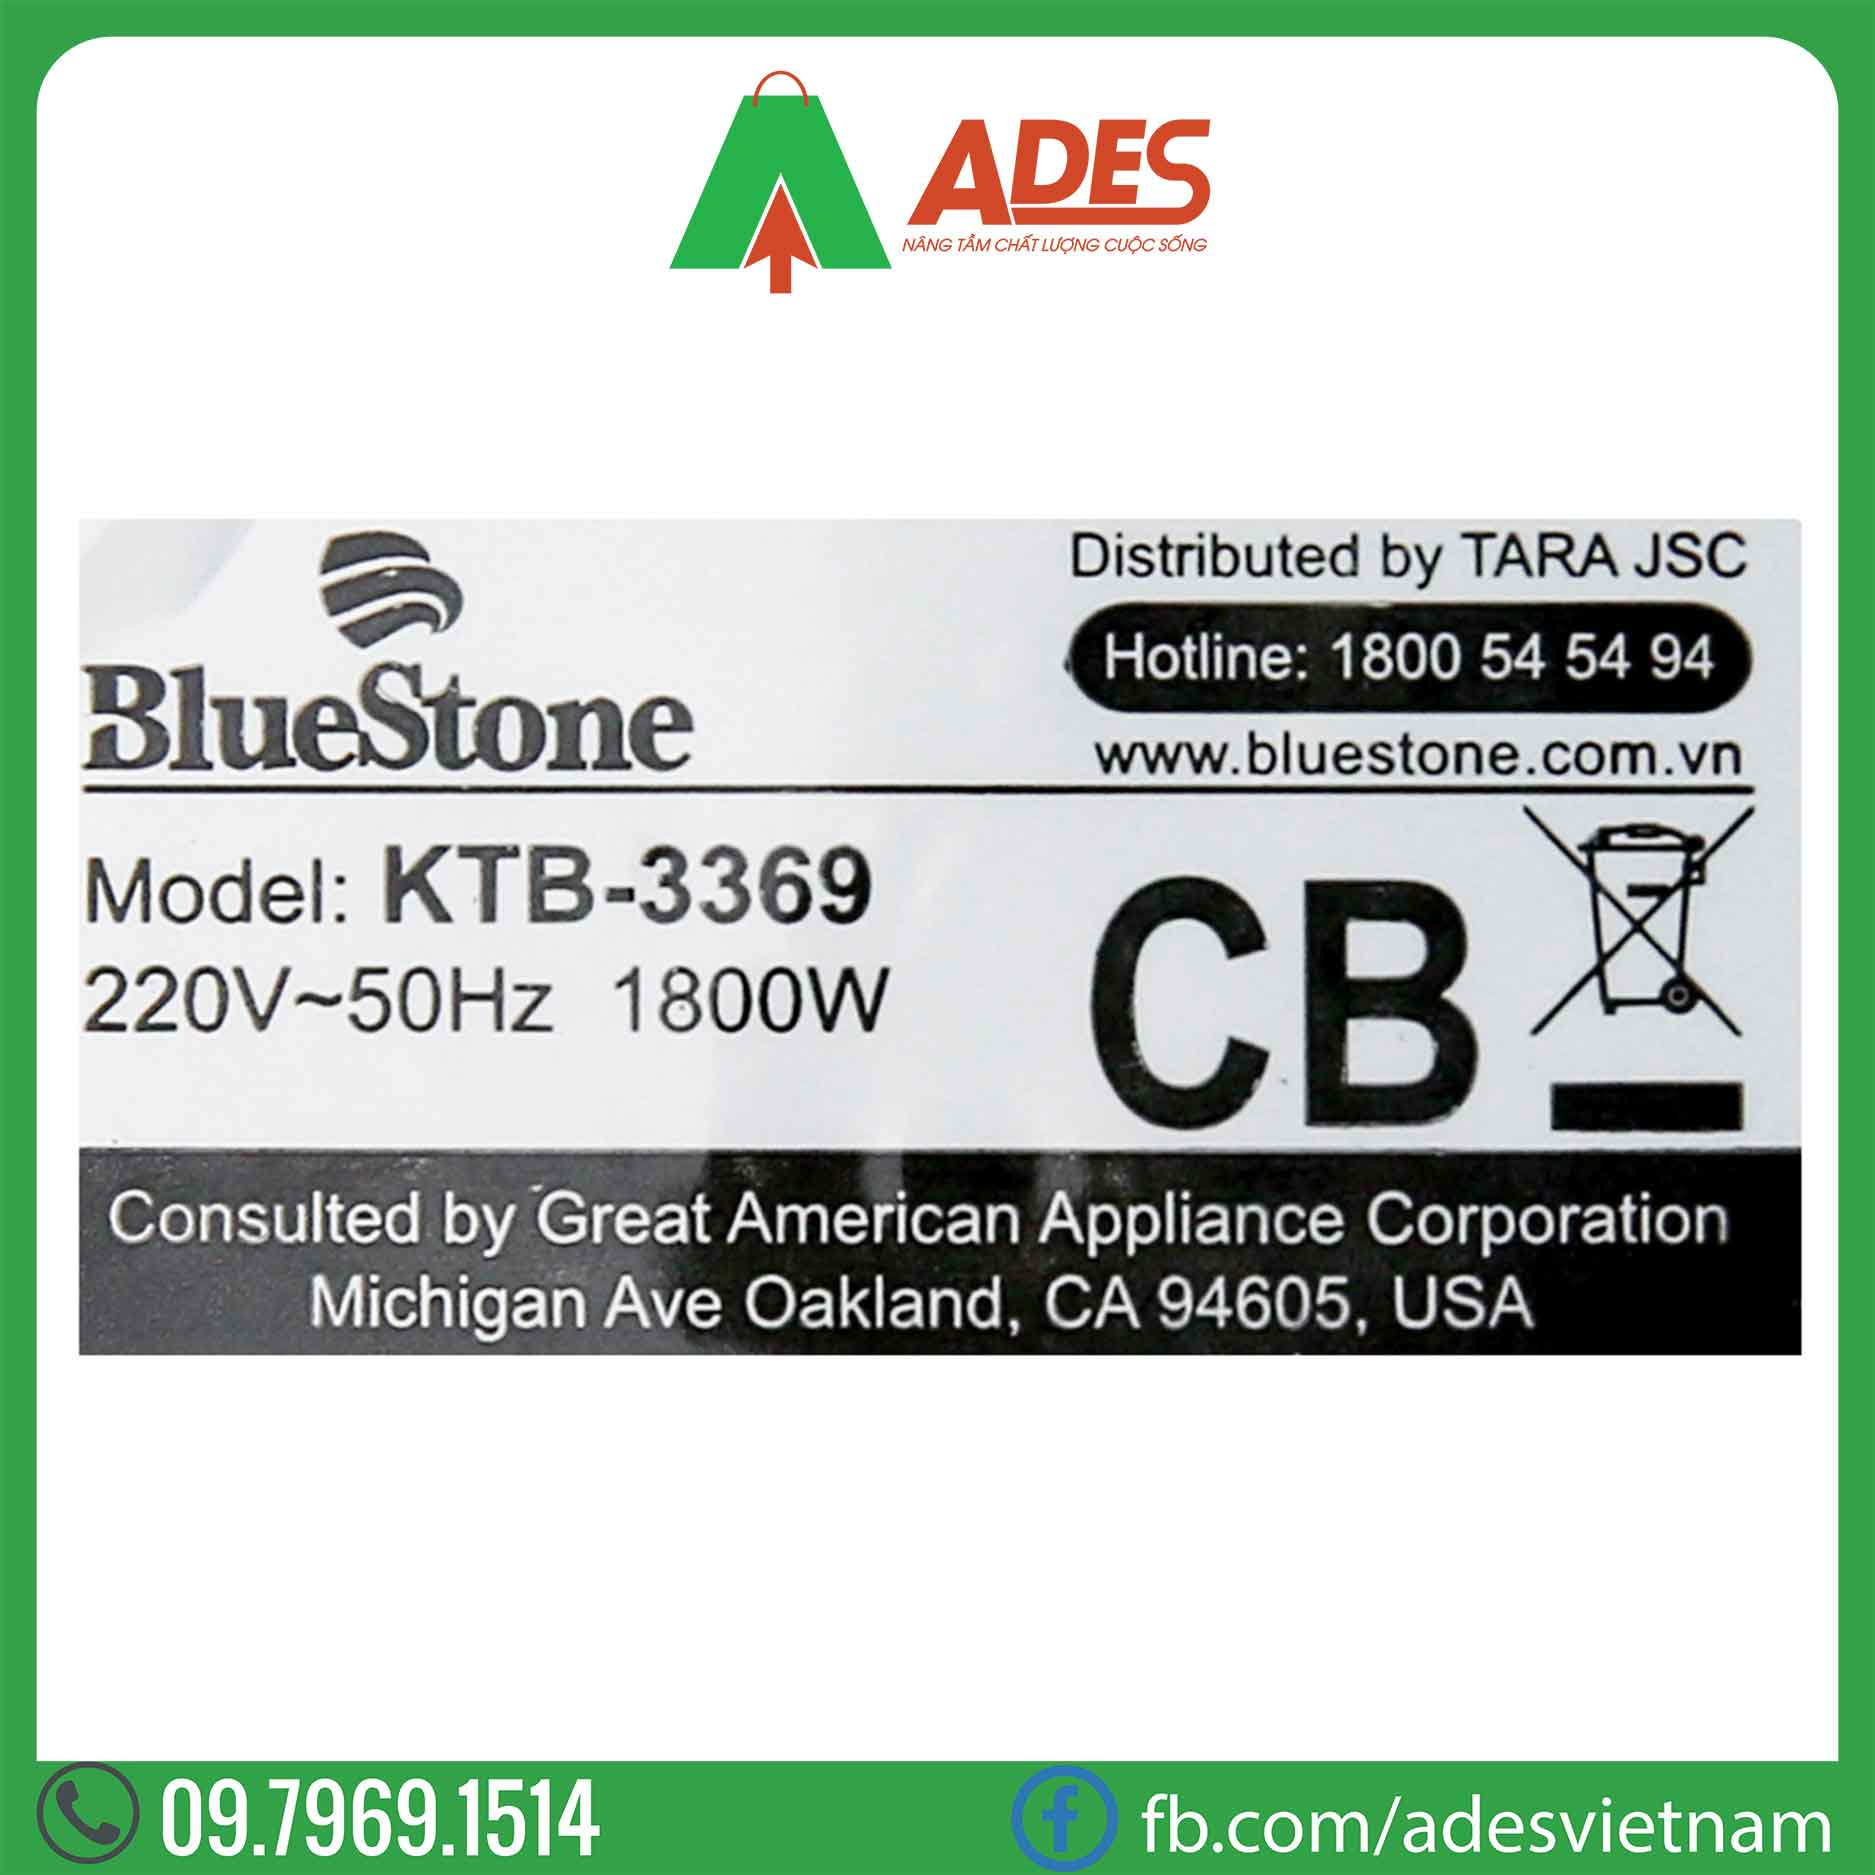 Am sieu toc Bluestone KTB-3369